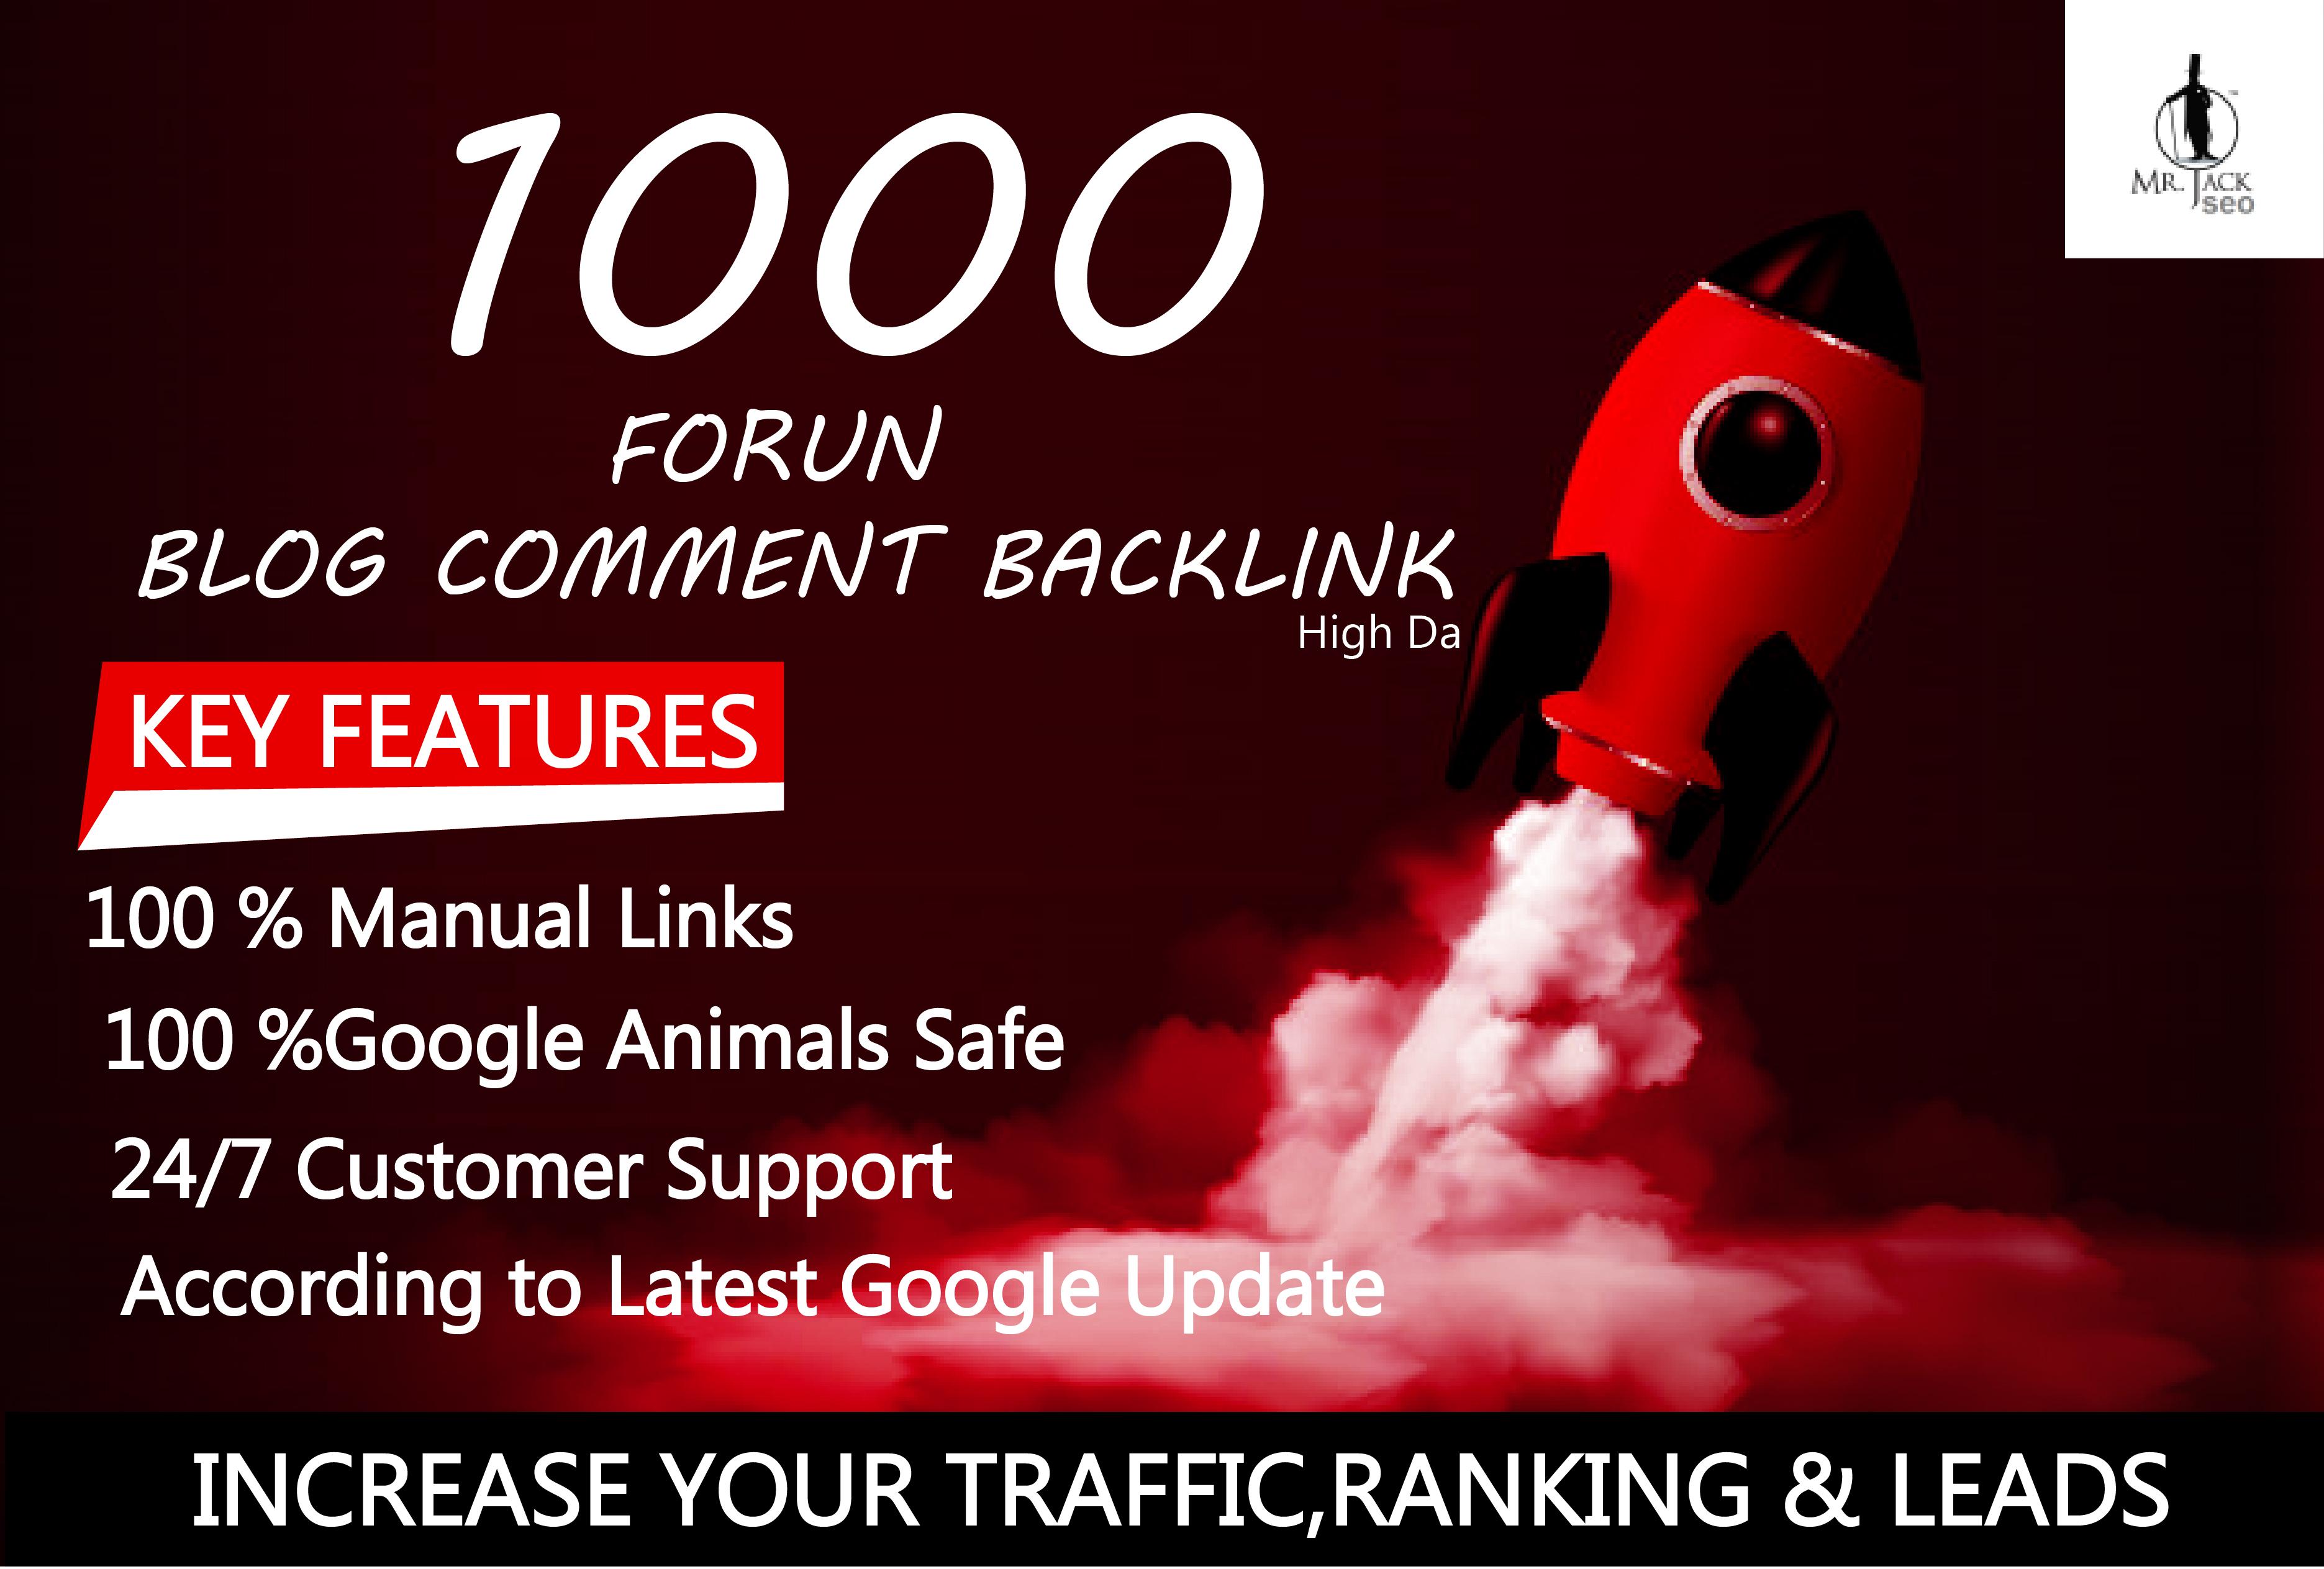 1000 forum Blog Comment Backlinks High DA